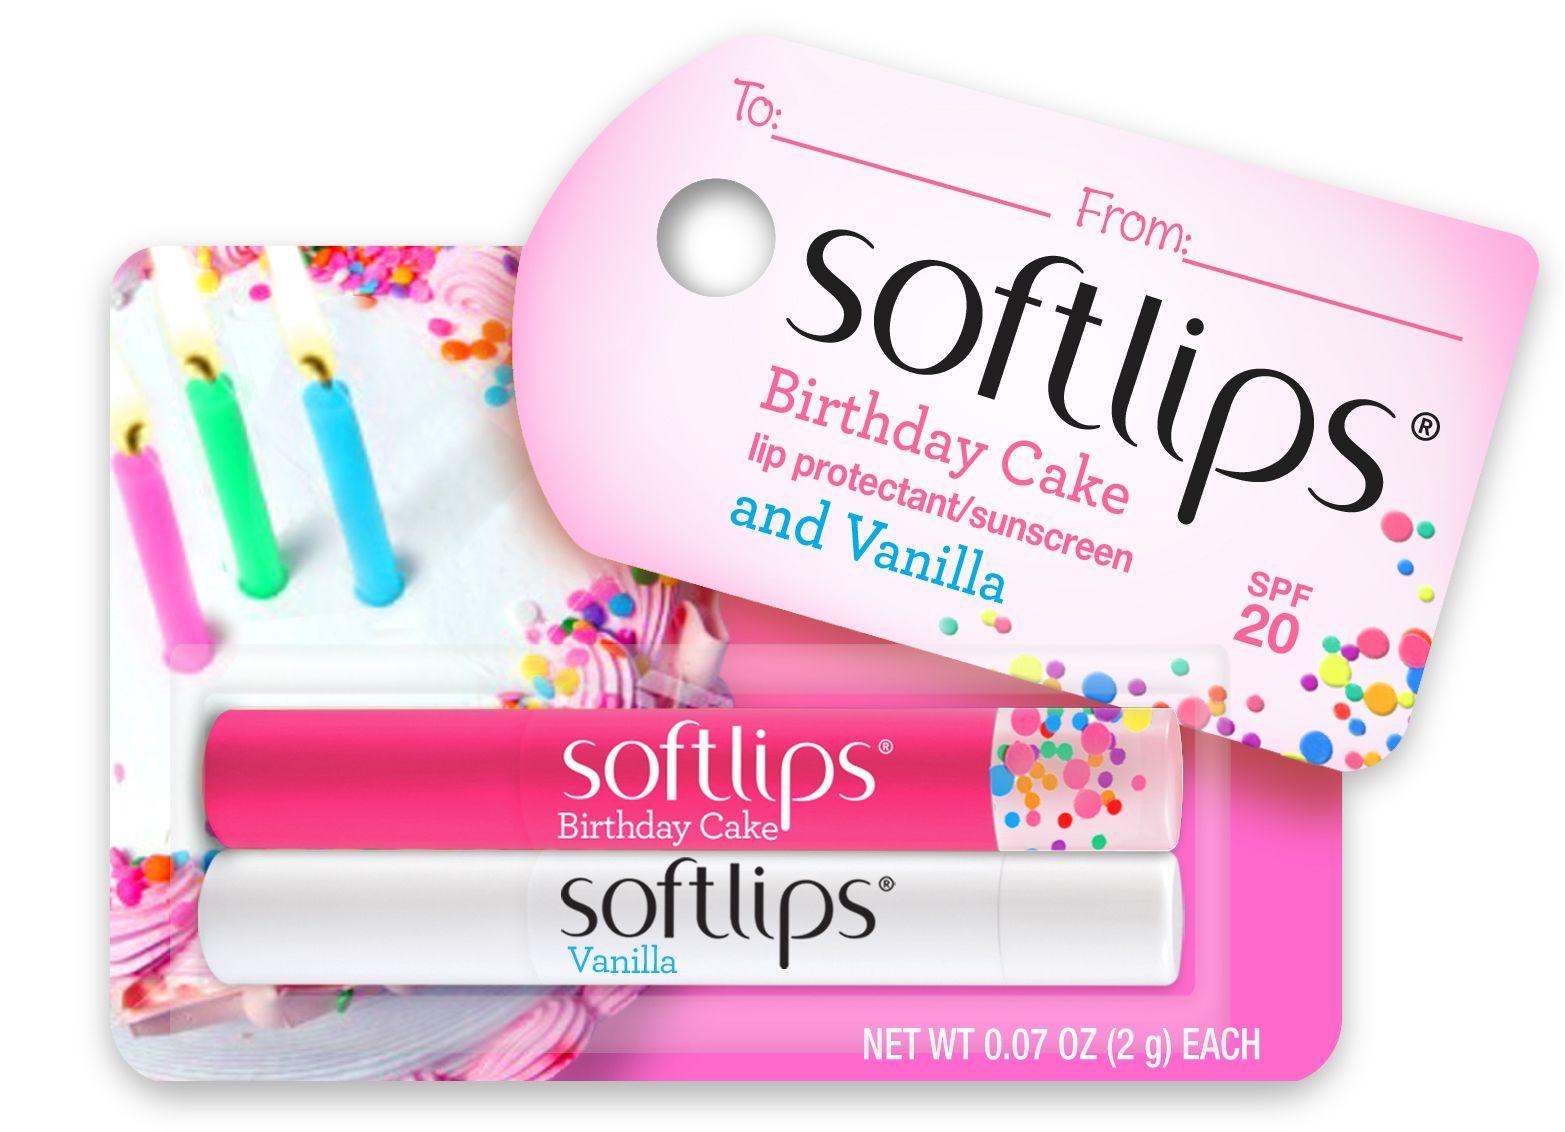 Softlips Cake